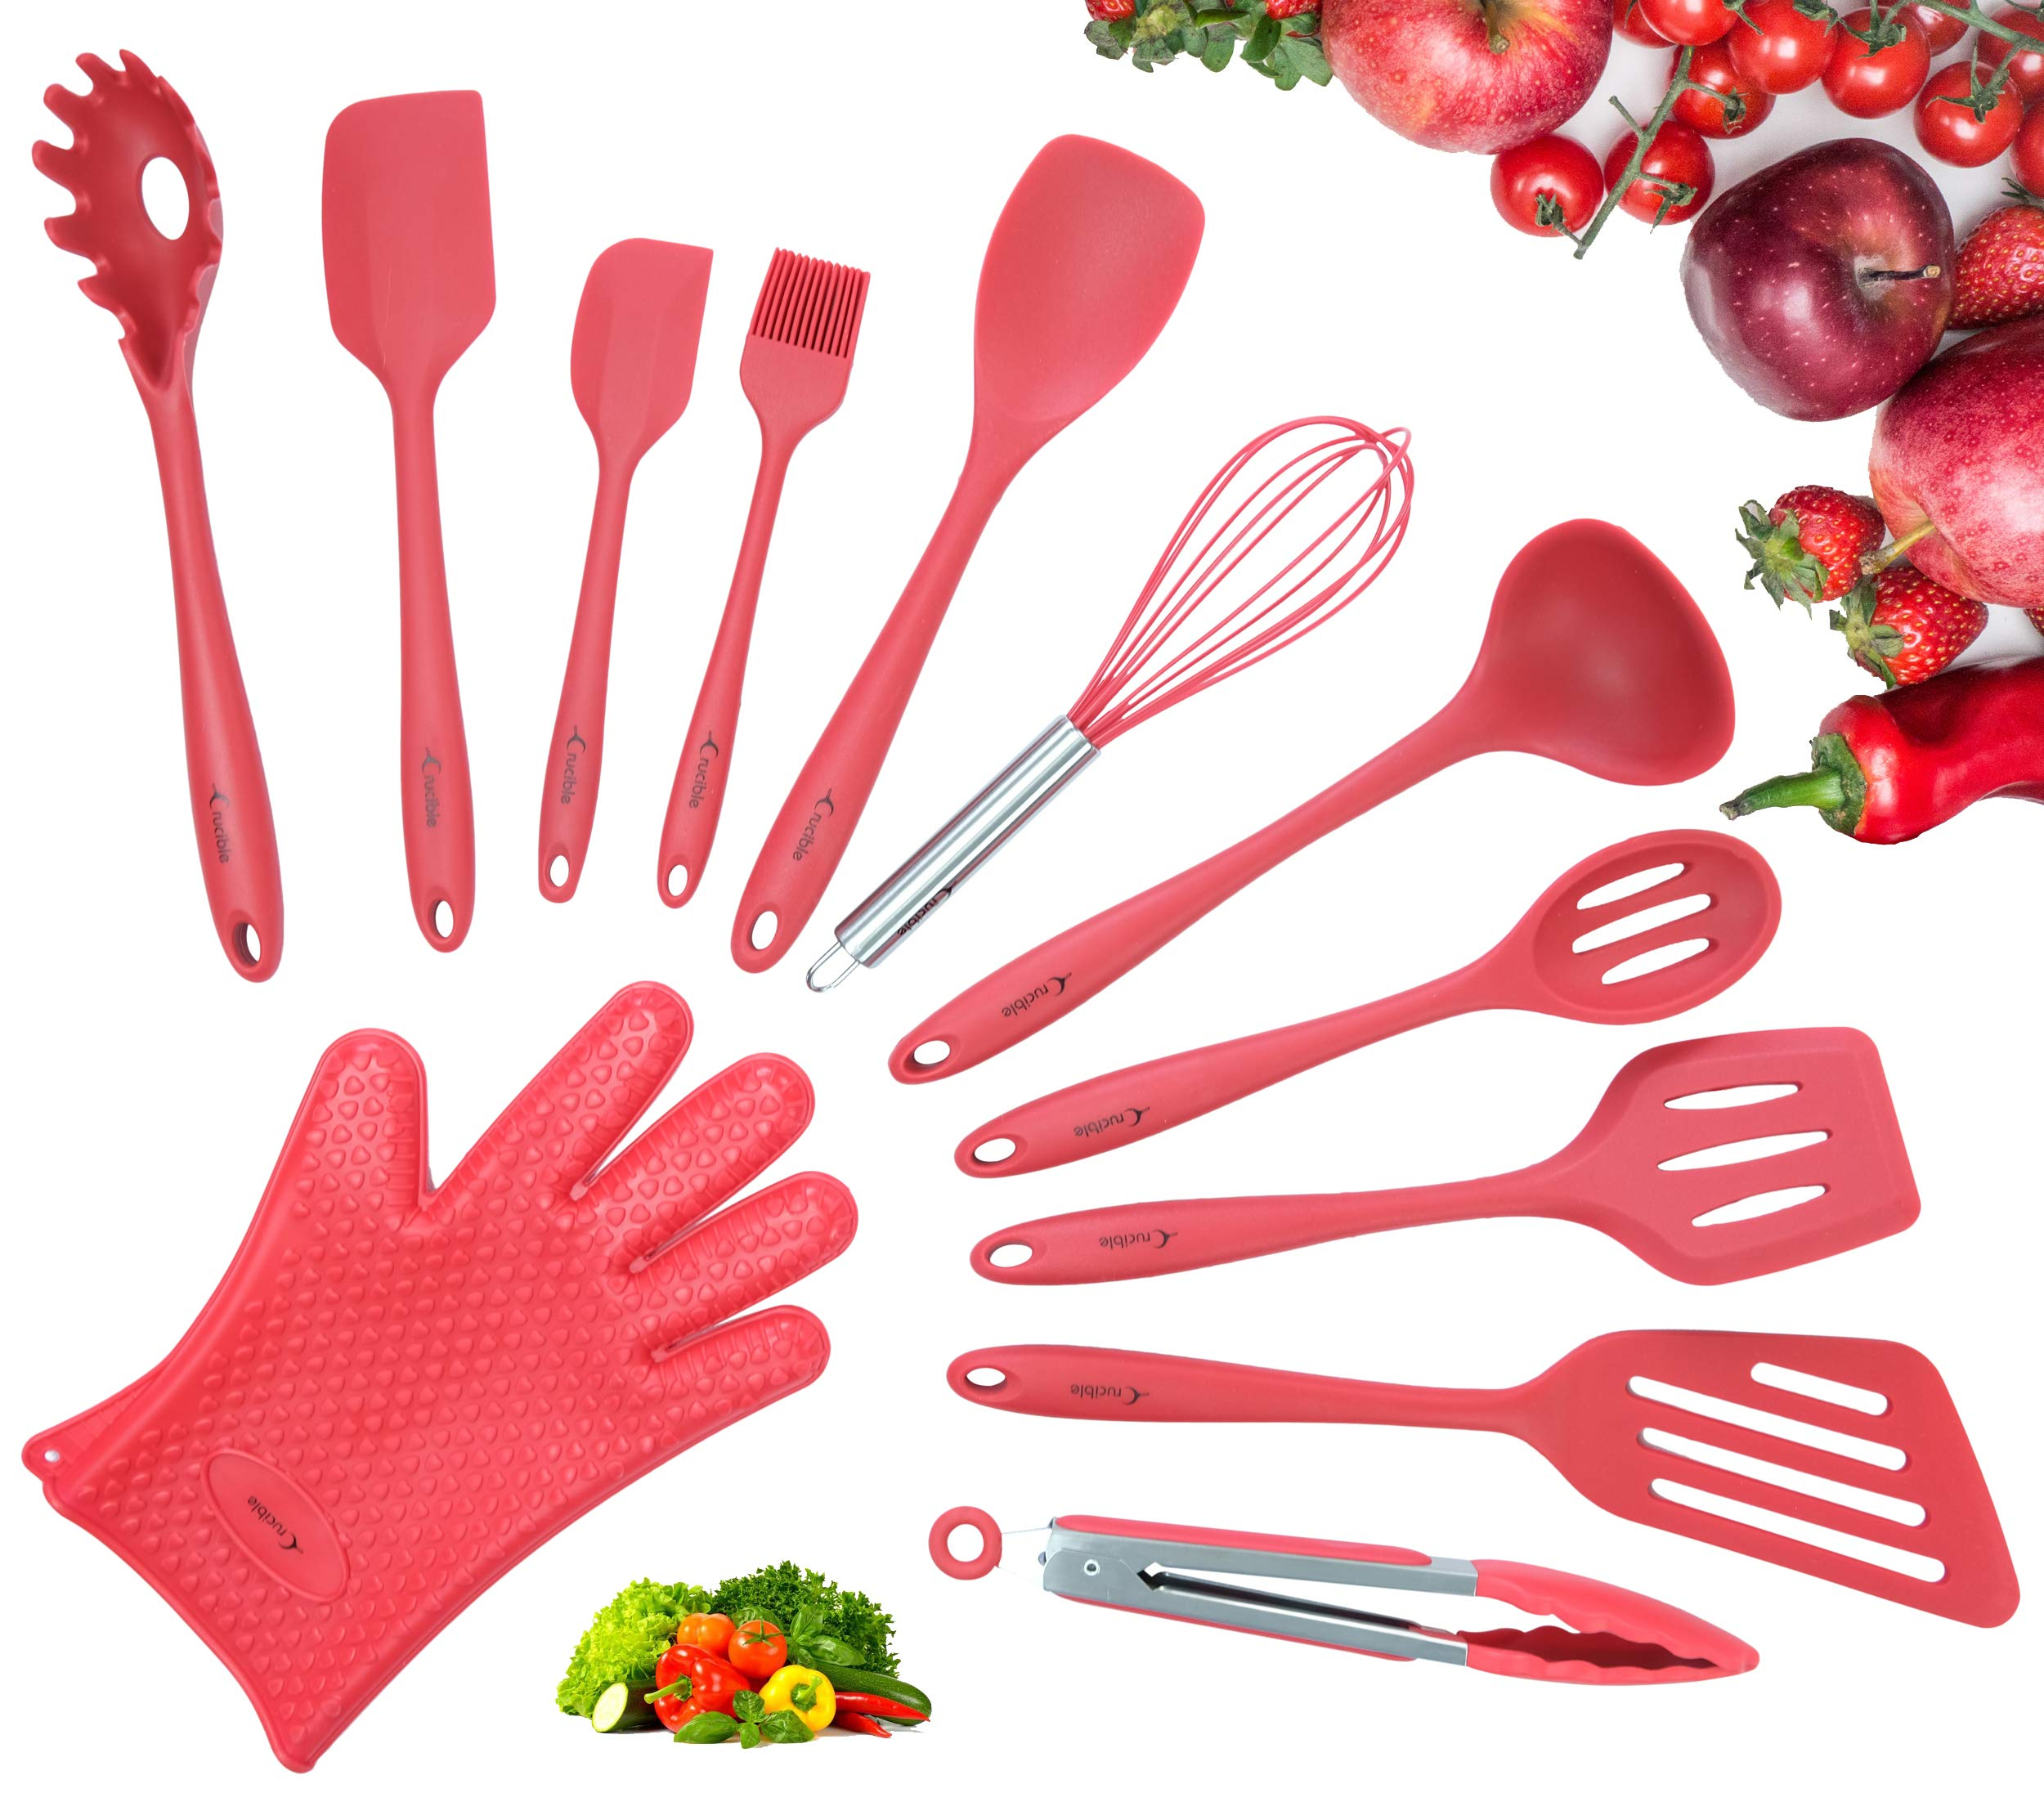 Utensils Set, 12-Piece Complete Silicone Baking & Cooking Kitchen Tools Set, Cookware Set, BBQ, Kitchen Gadgets - Red - Utensilios de Cocinas